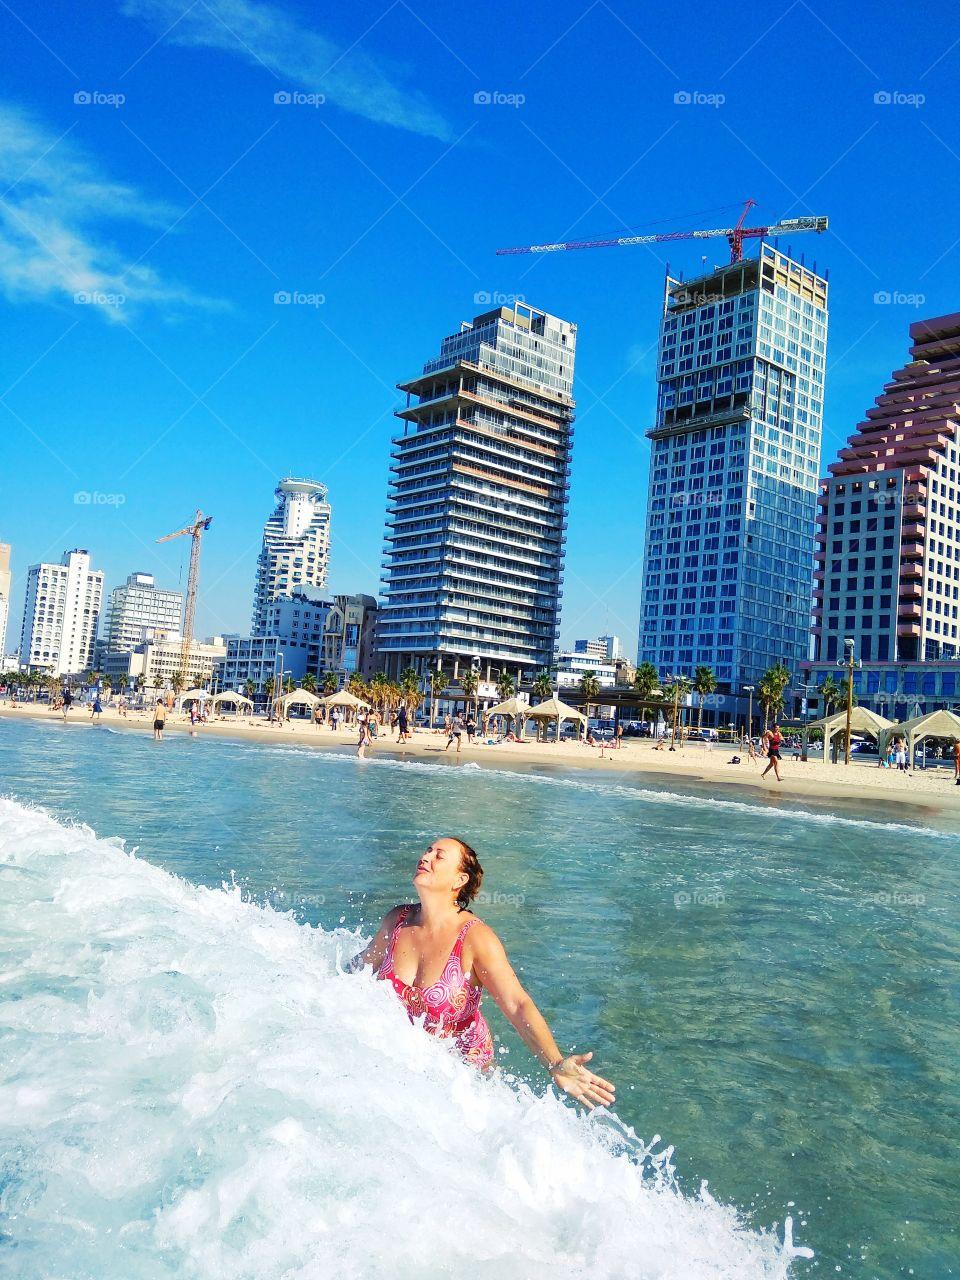 Pure hapiness and fun on beach of Tel Aviv, Israel!